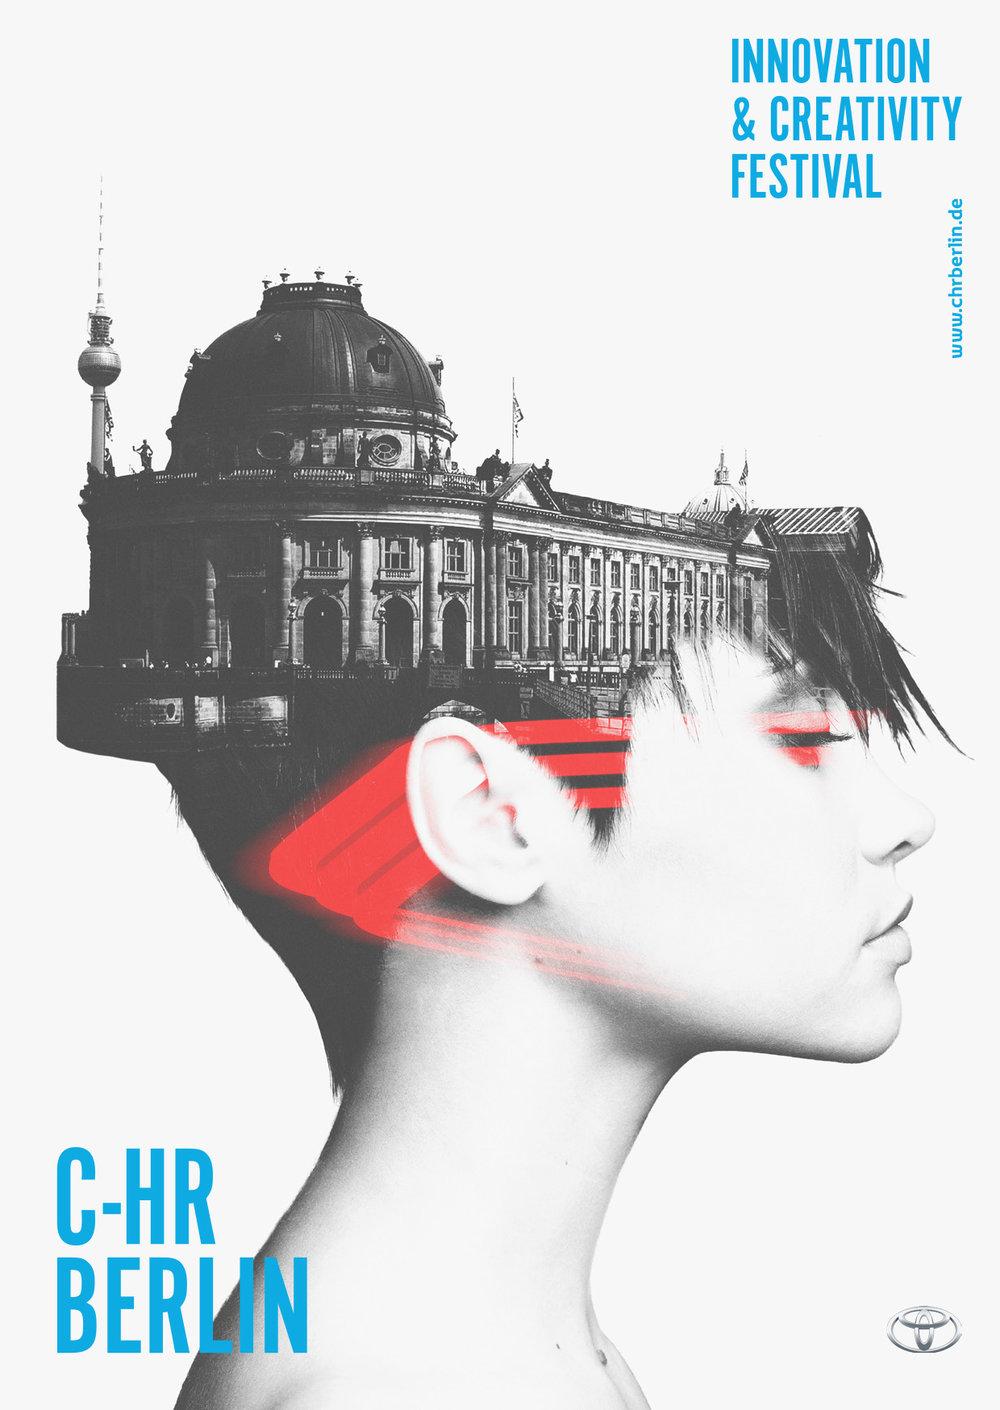 C-HR_BERLIN_A6_Postcards_1-6.jpg